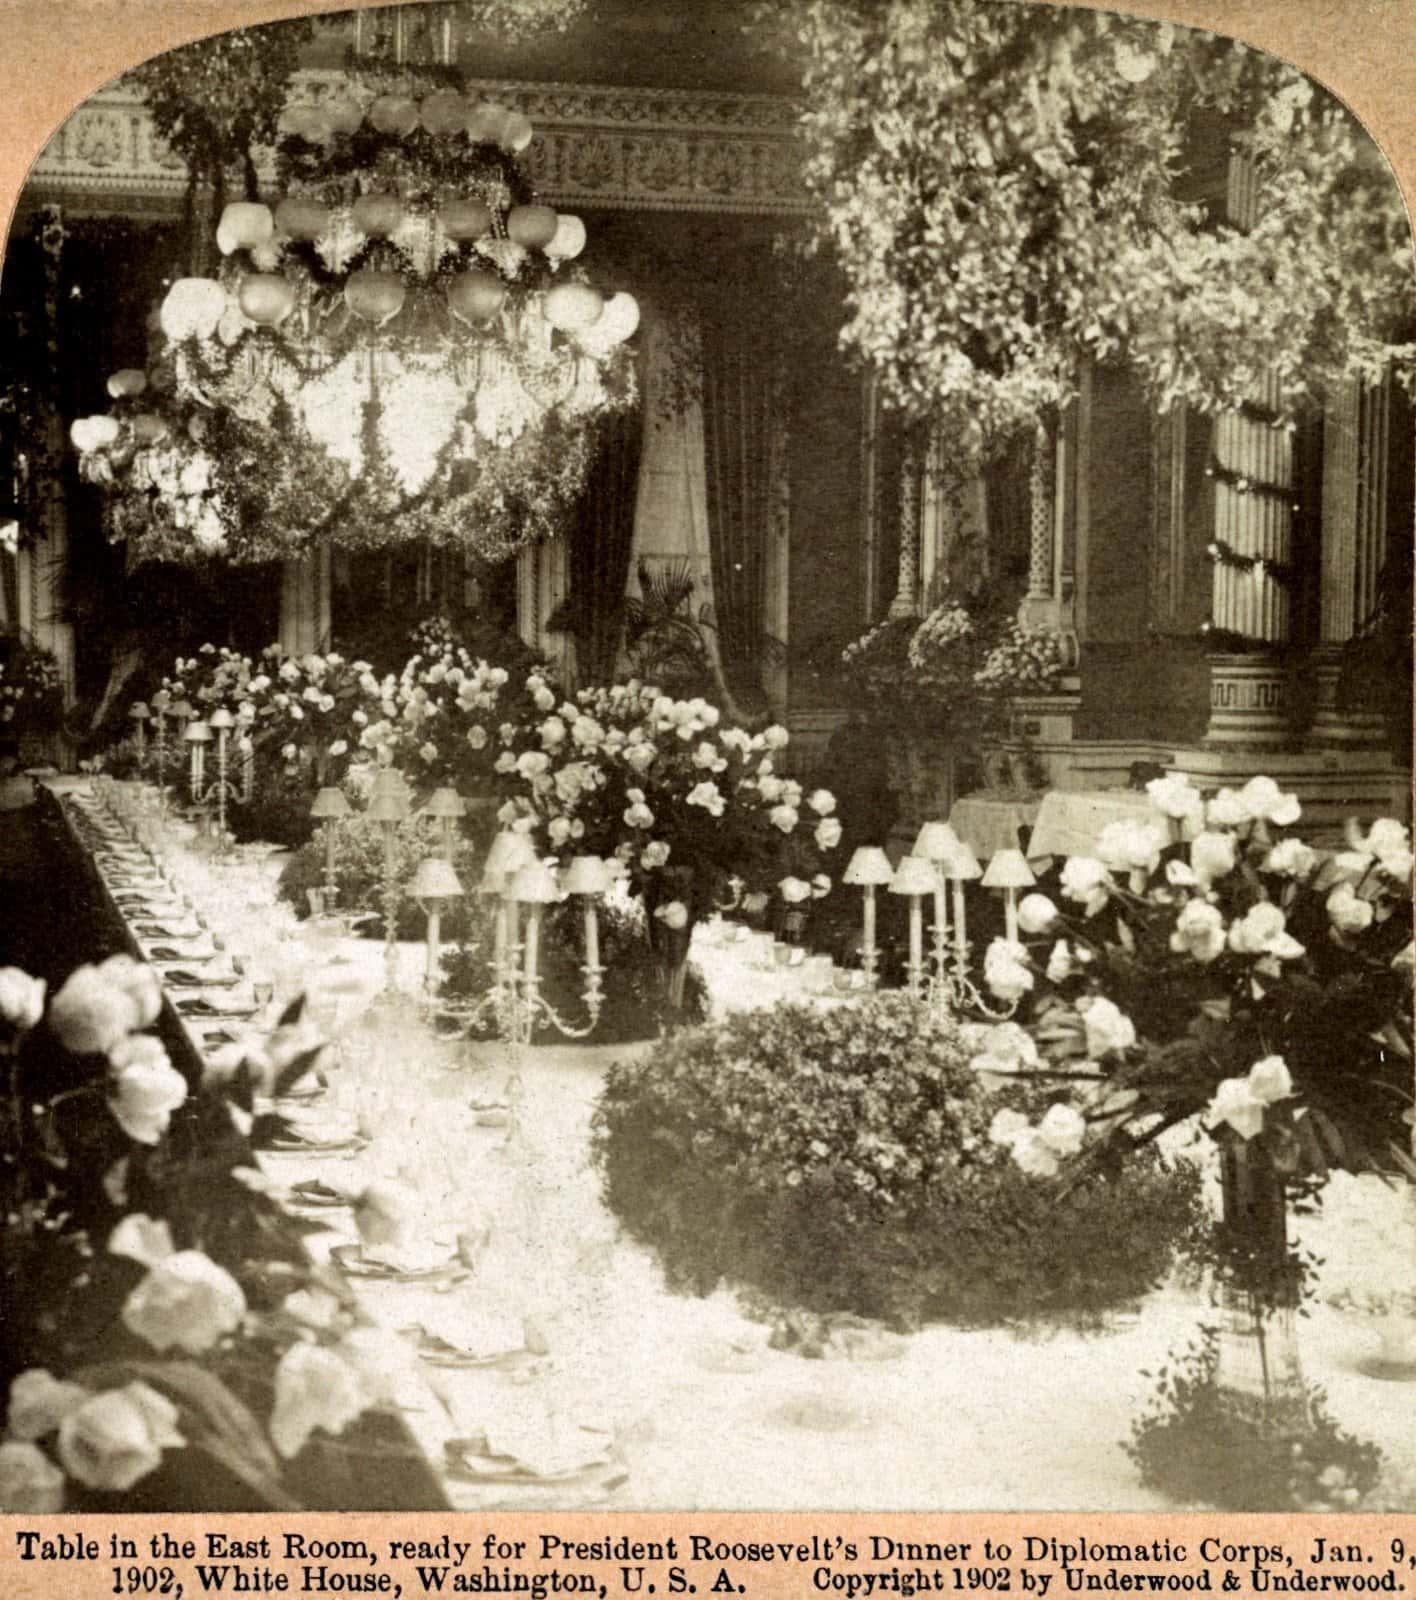 President Roosevelt's dinner to Diplomatic Corps (1902)